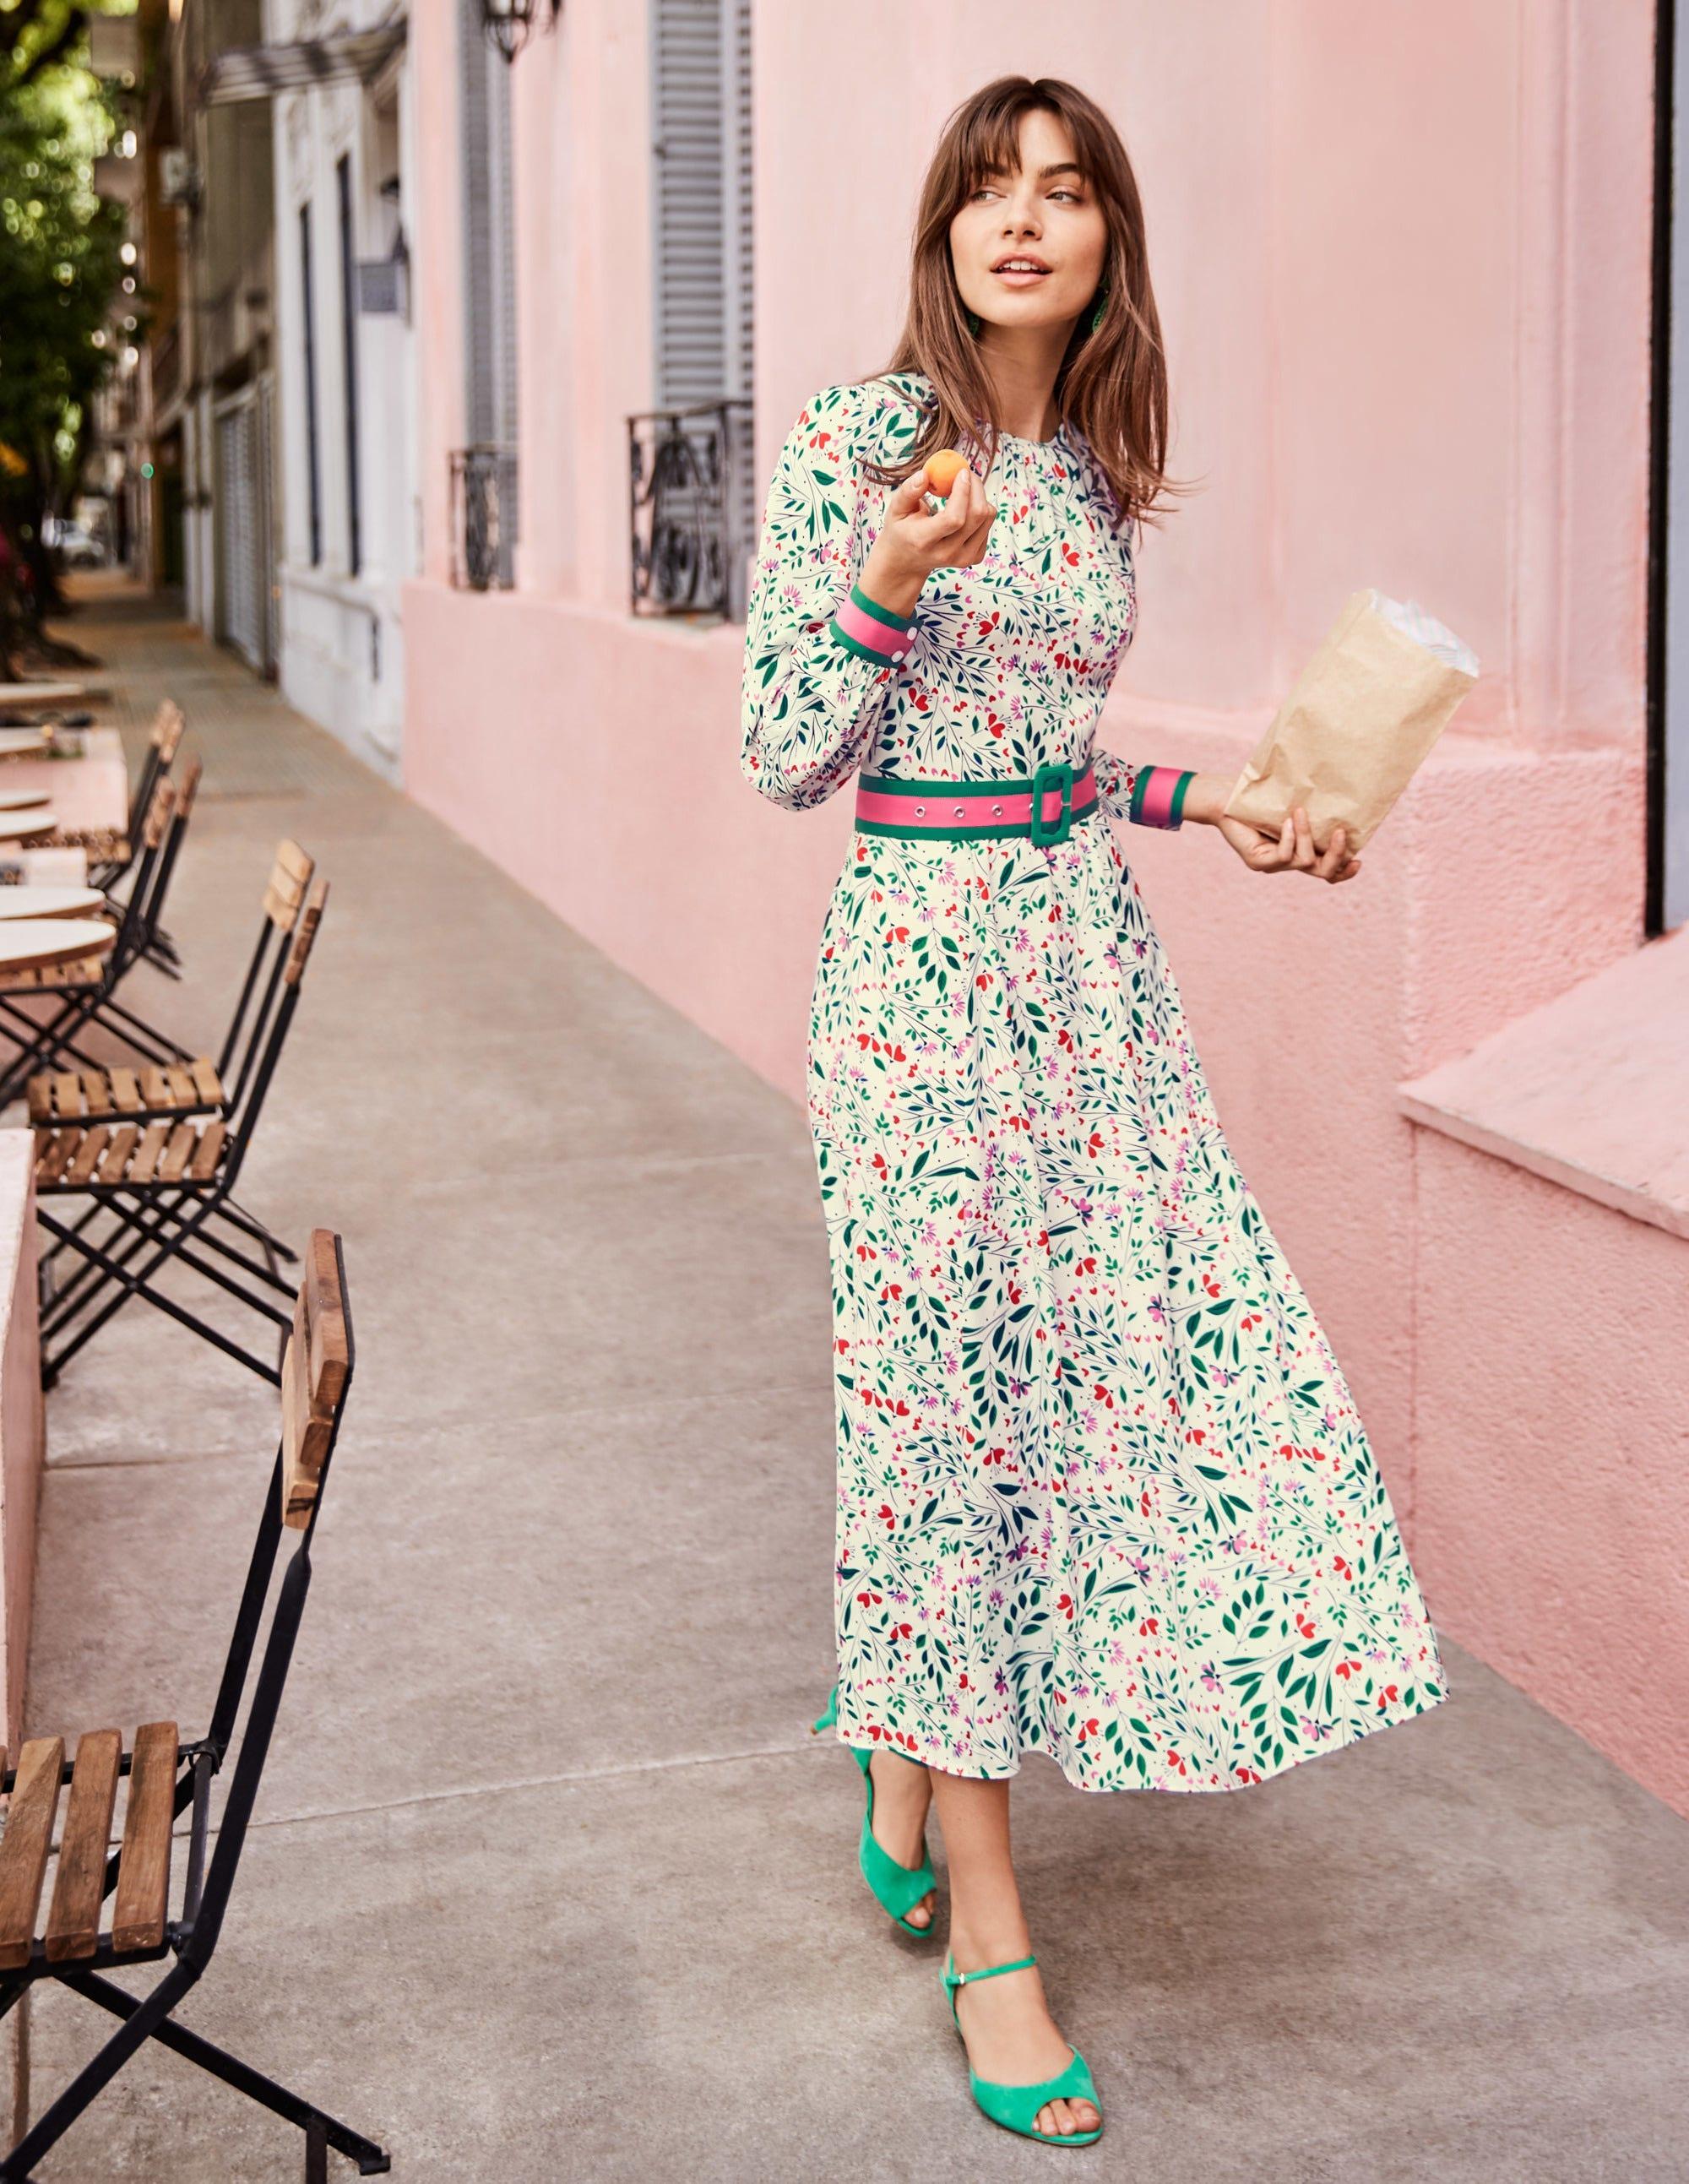 Victoria Midi Dress - Ivory, Garden